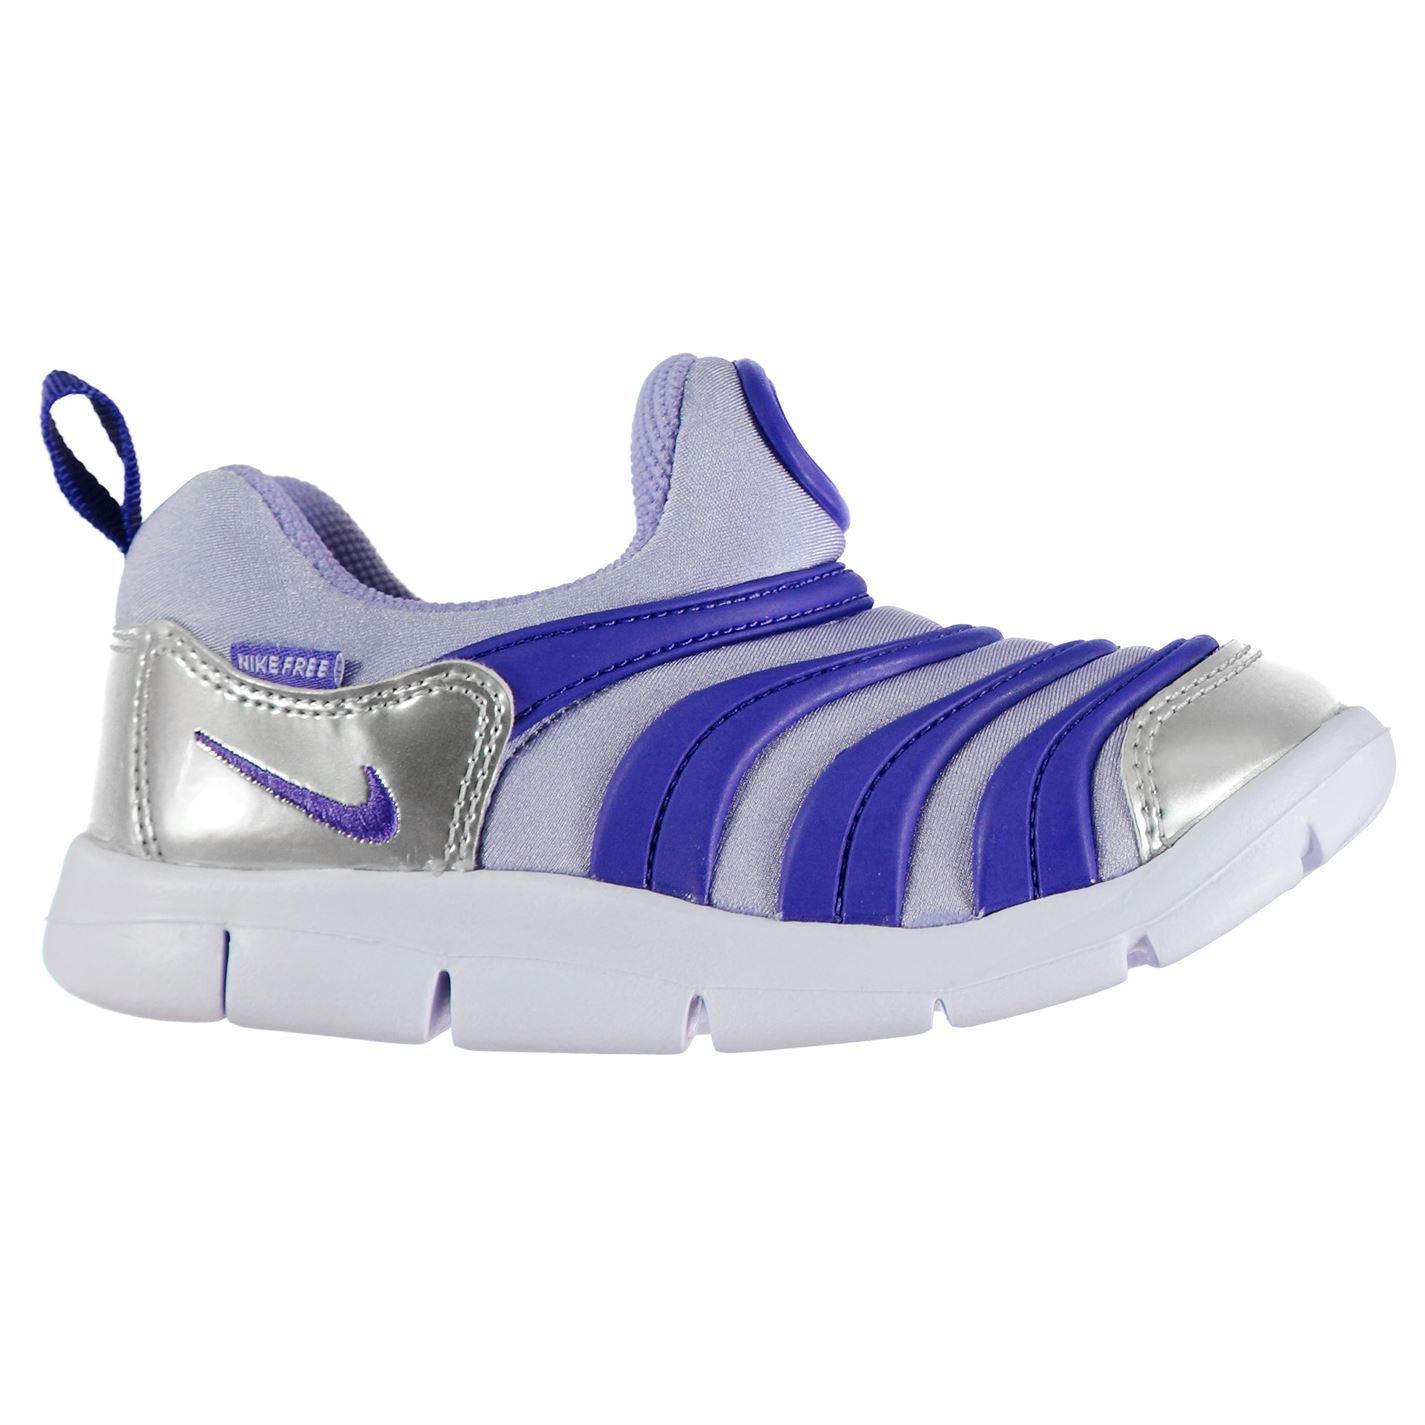 fdc780a959650 ... Nike Dynamo Free Trainers Infant Girls Shoes Footwear